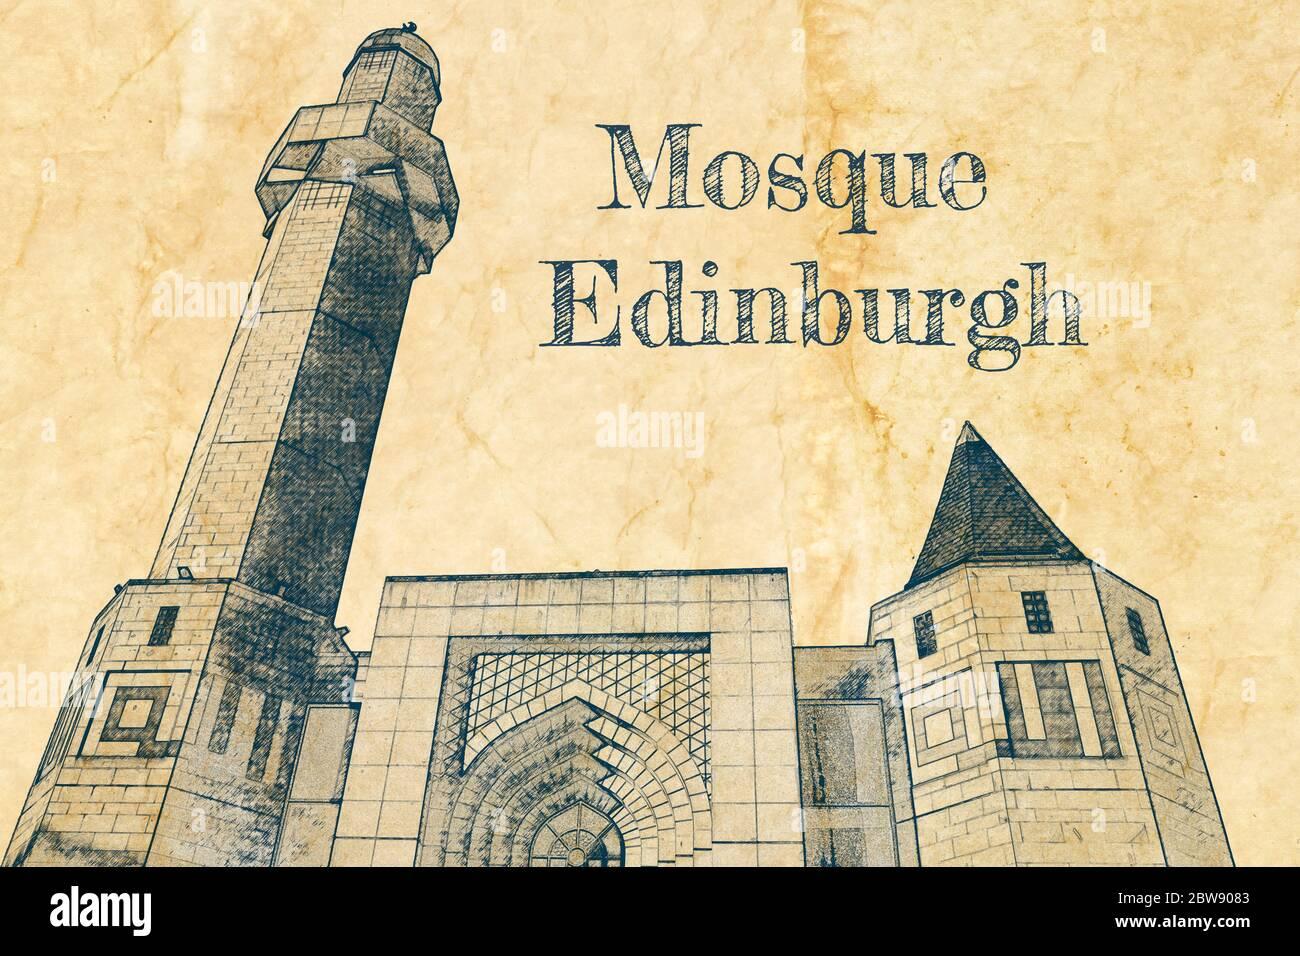 Edinburgh Central Mosque, Scotland, sketch on old paper Stock Photo